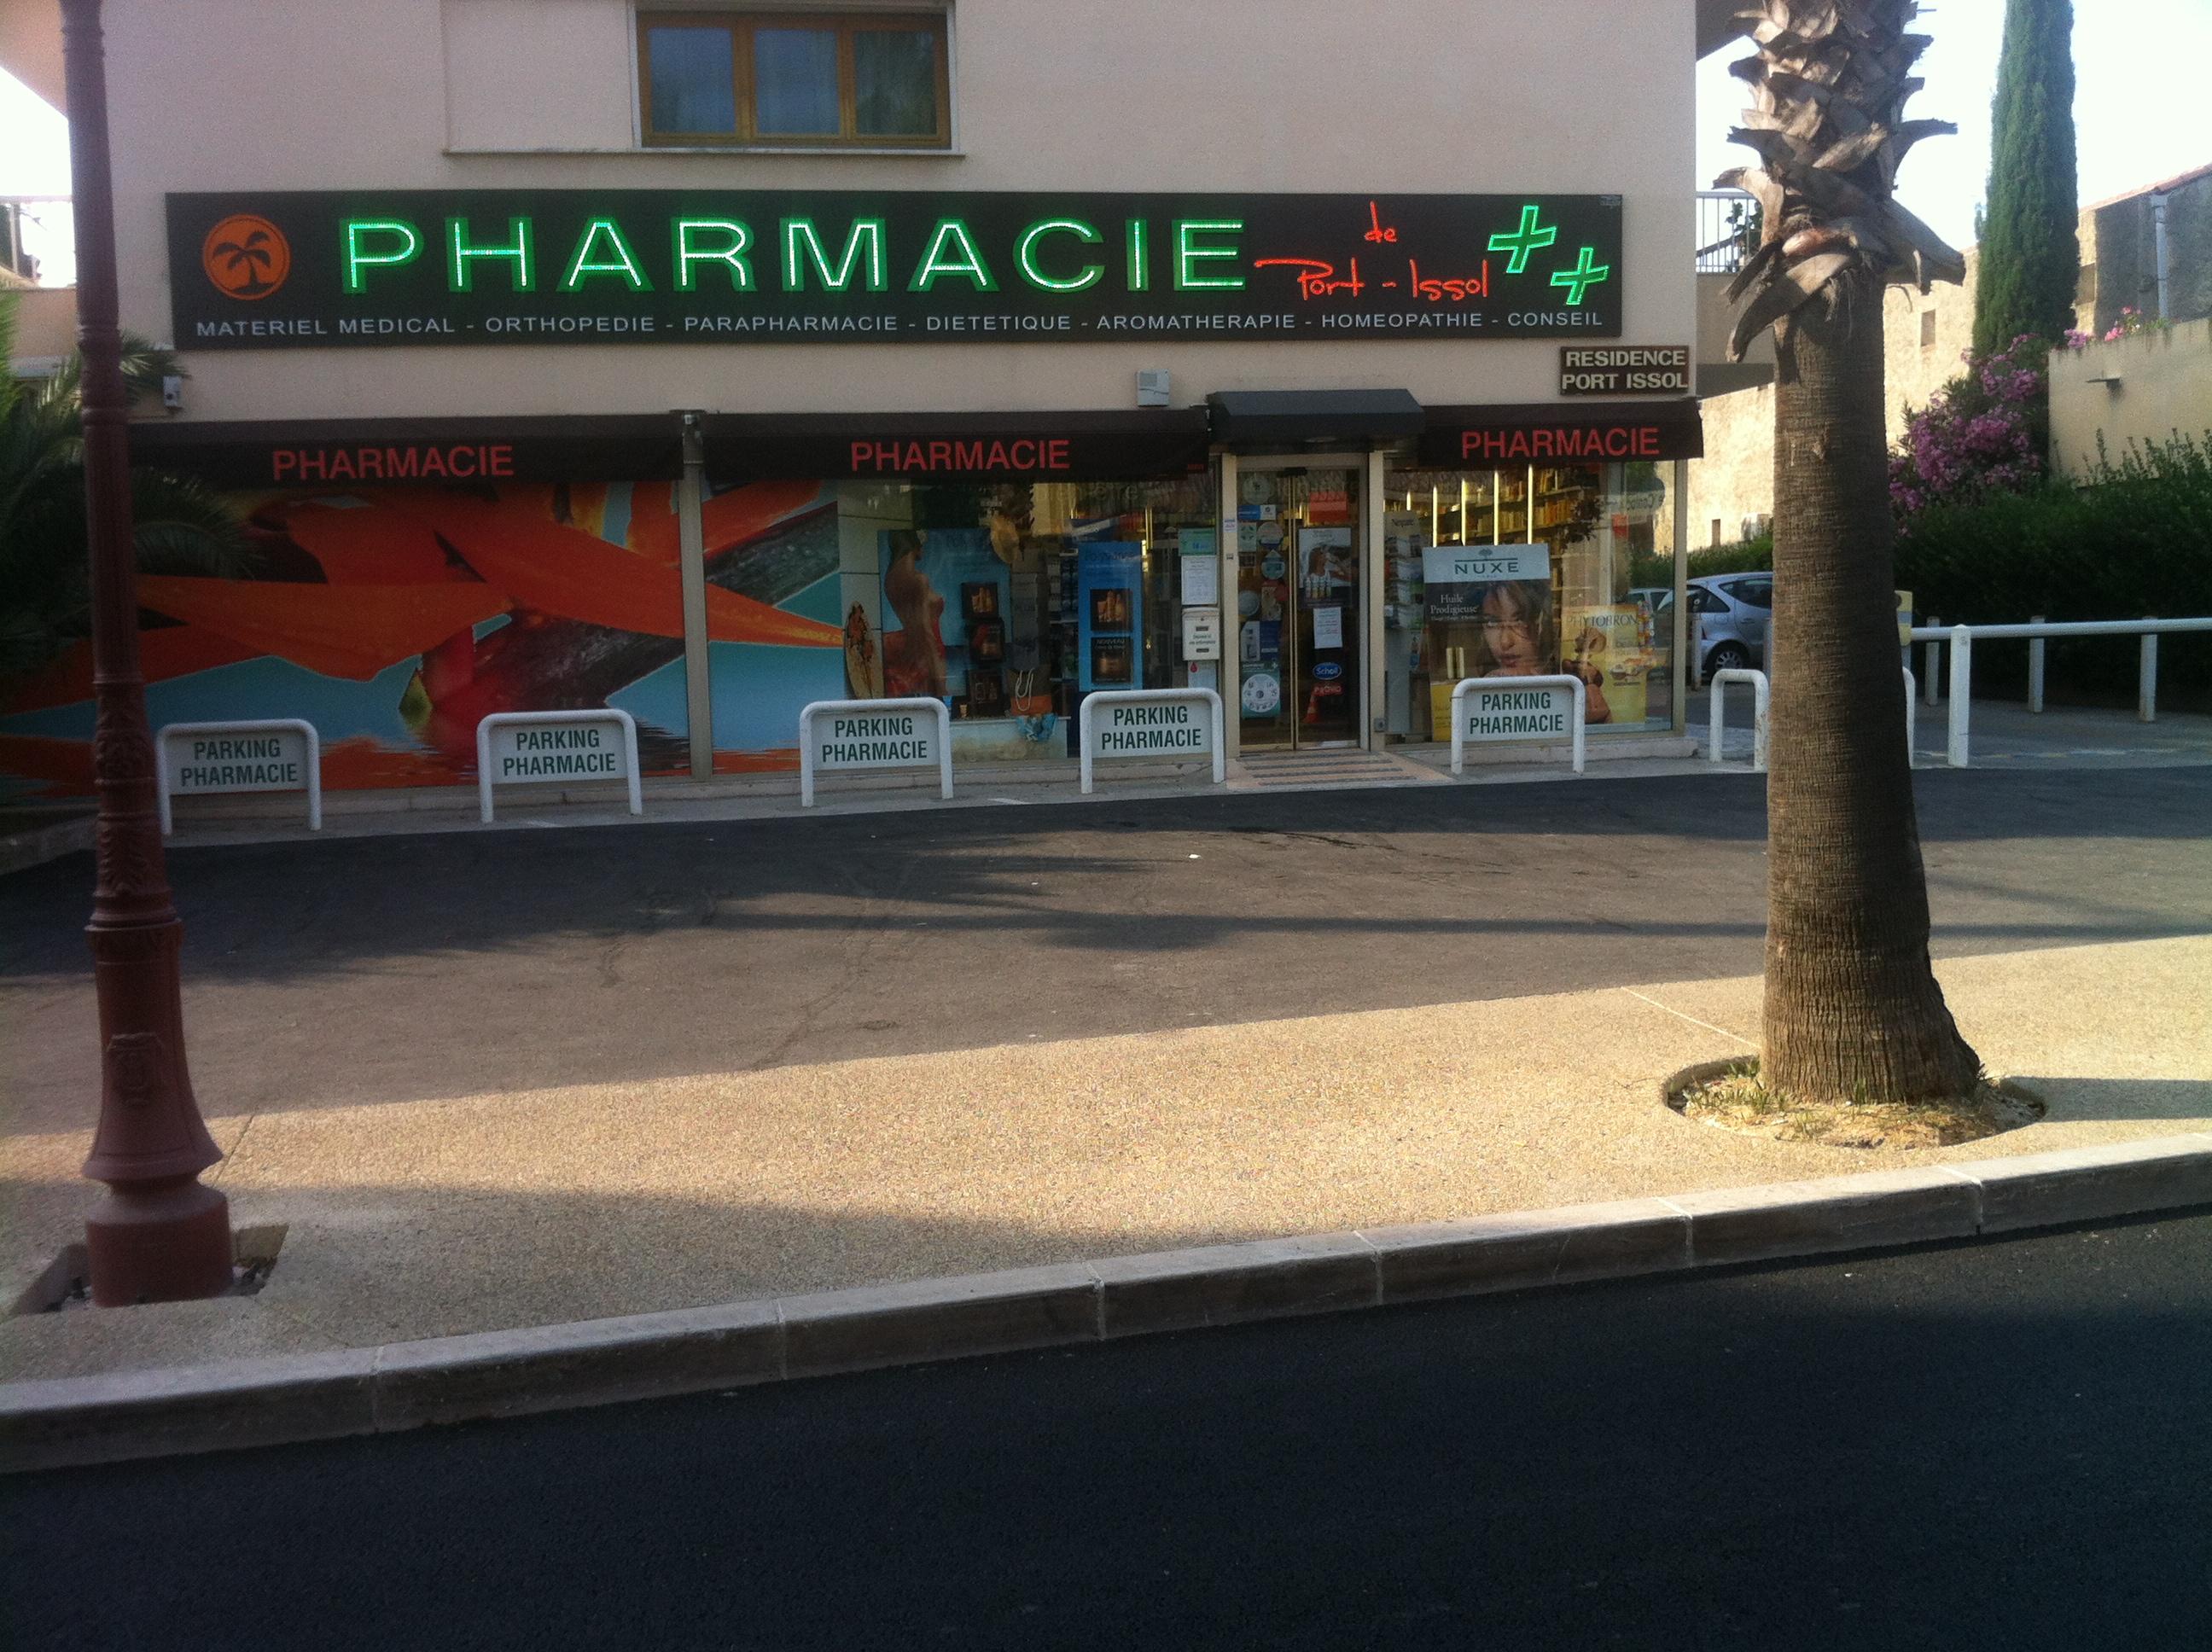 Pharmacie de port issol sanary sur mer vente en ligne - Pharmacie en ligne frais de port gratuit ...